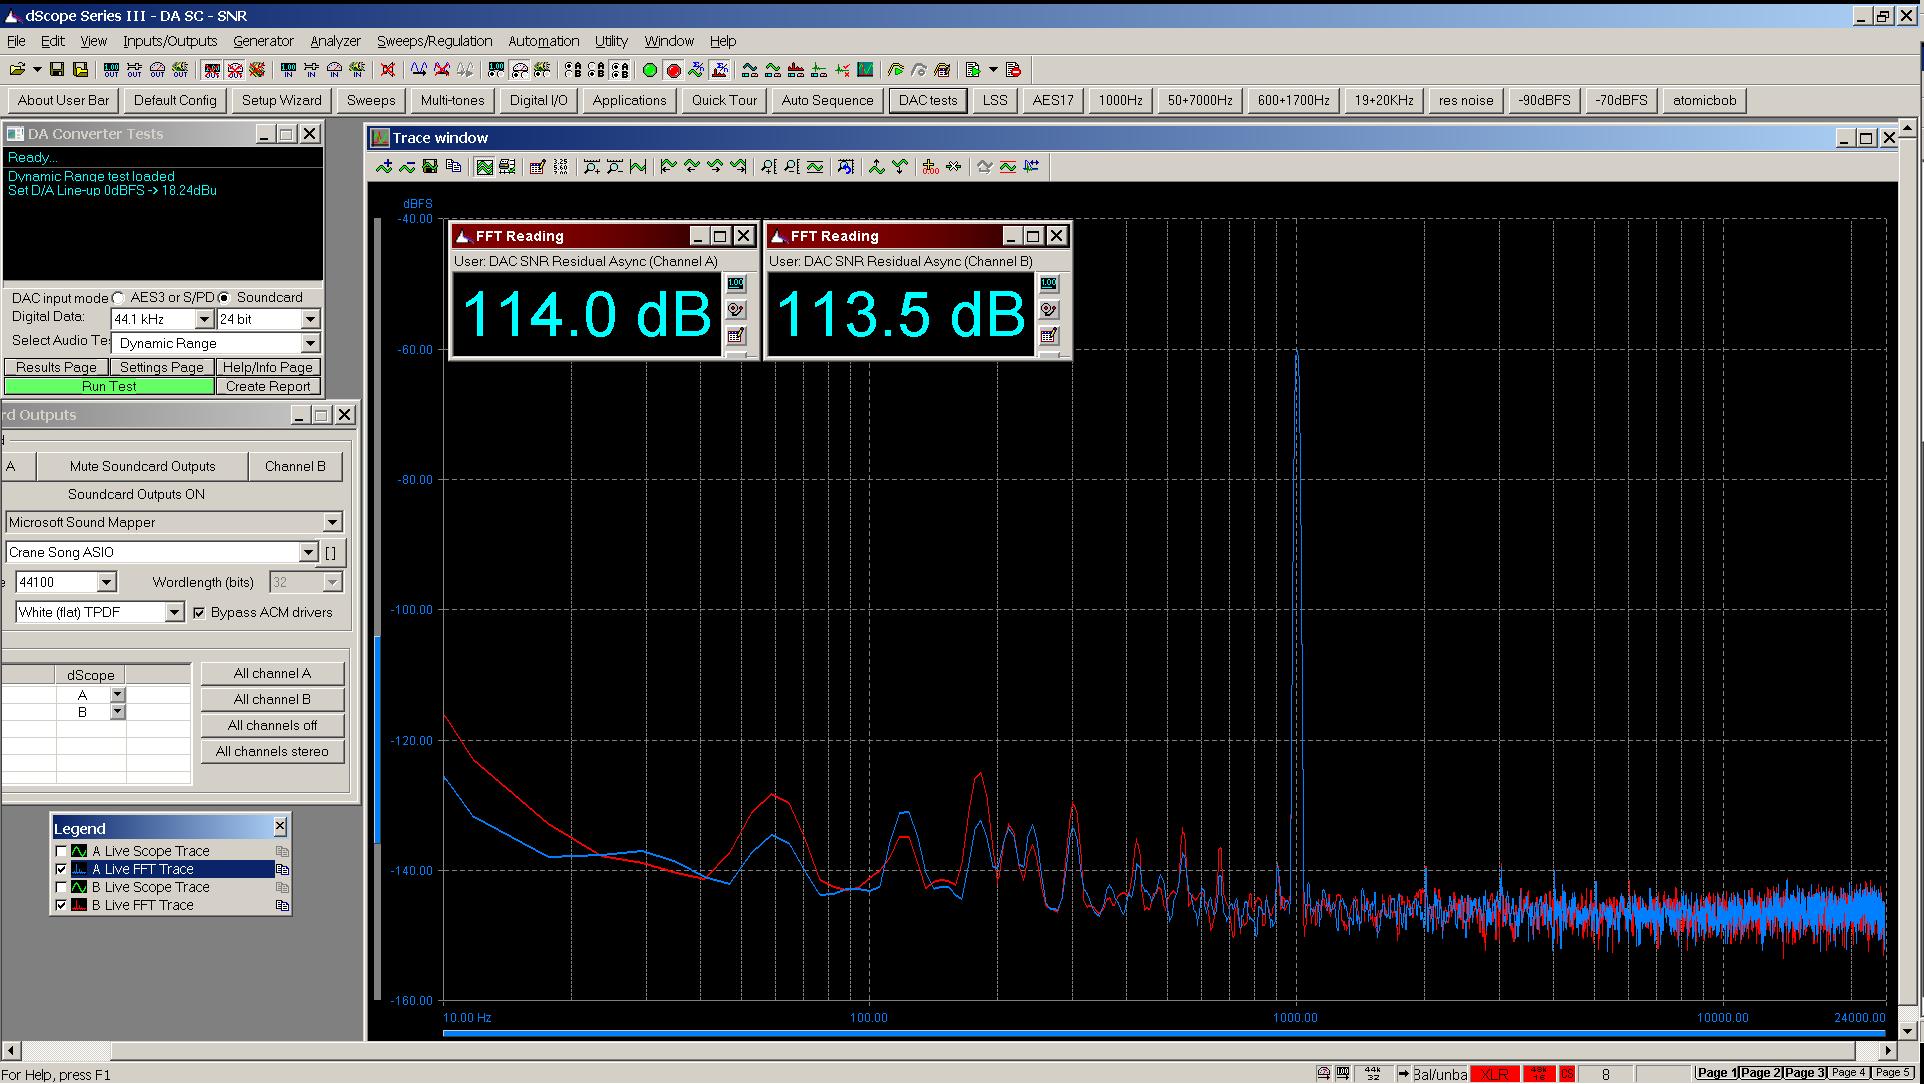 20190327-14 solaris Bal dynamic range - USB.PNG